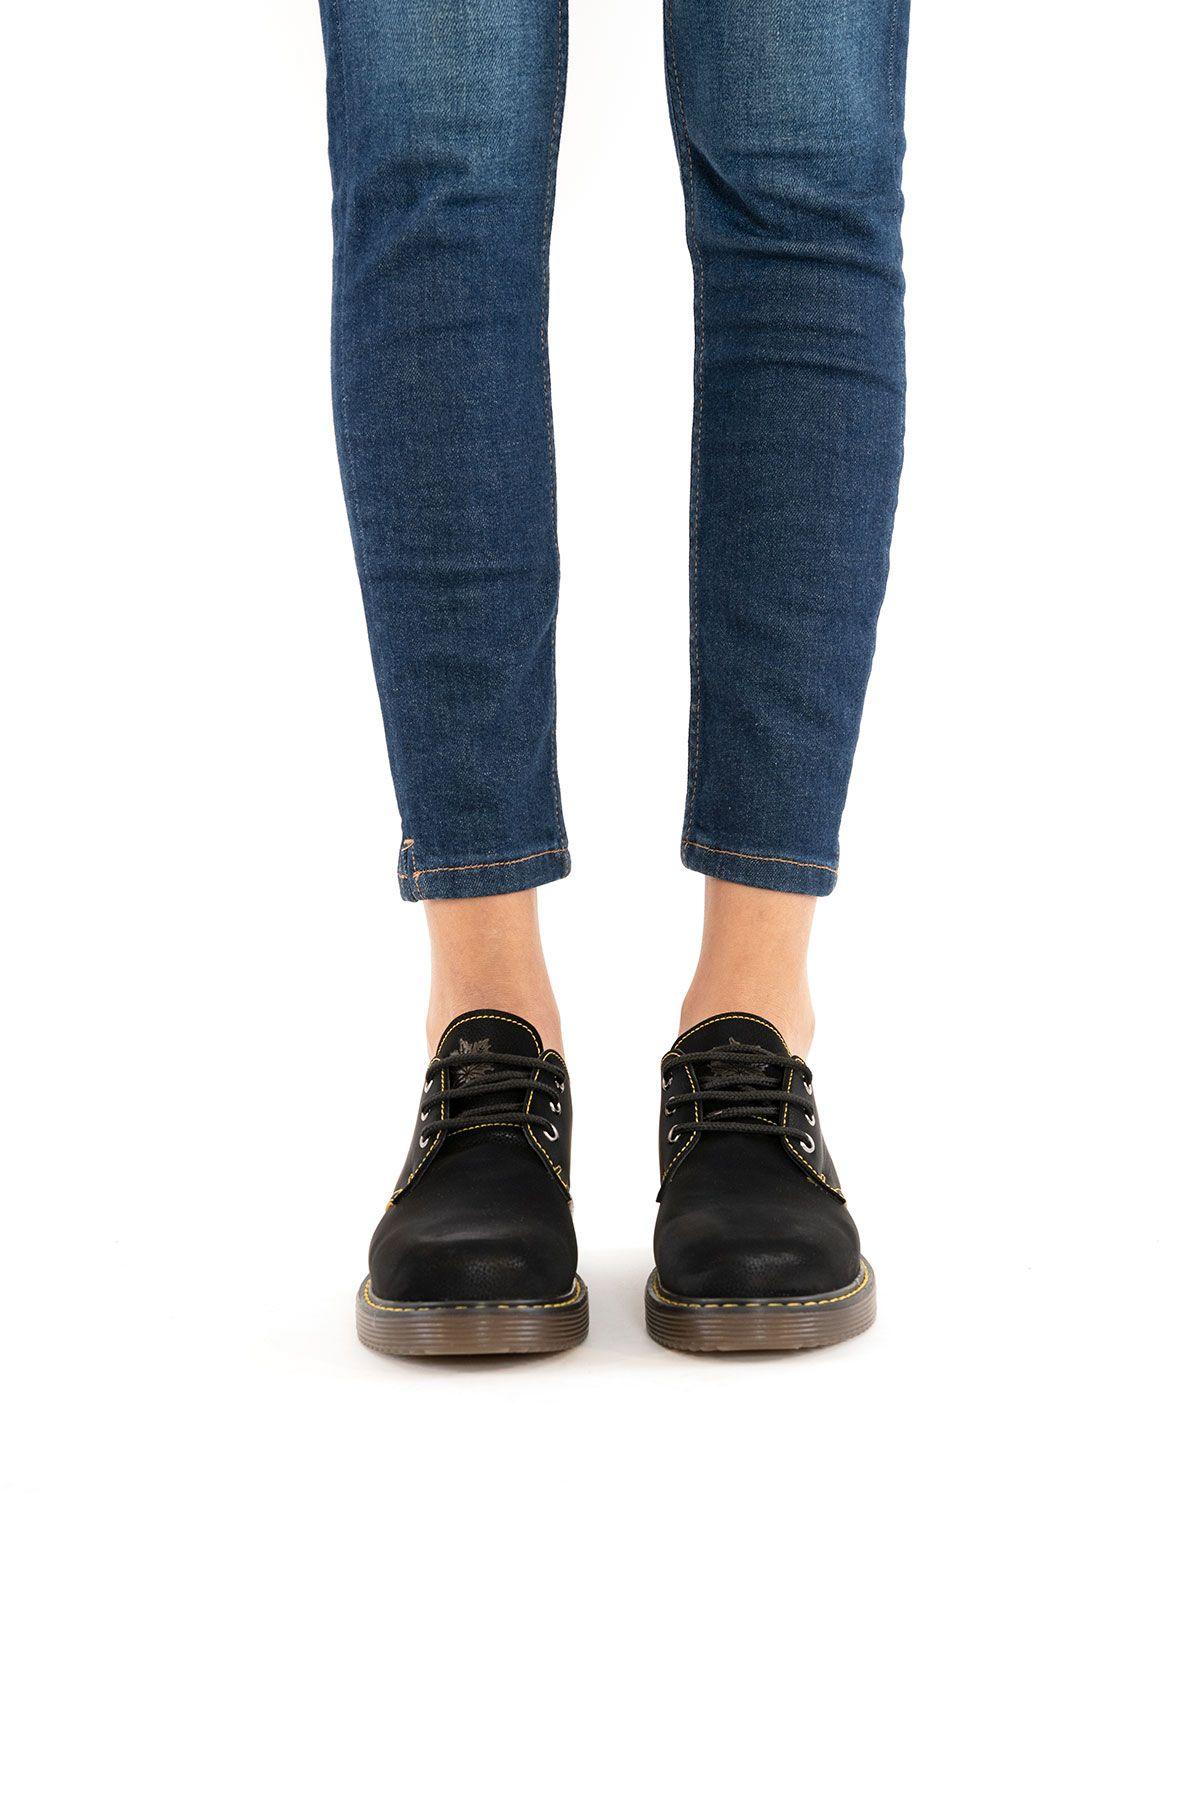 Pegia Genuine Nubuck Women's Shoes 500705 Black